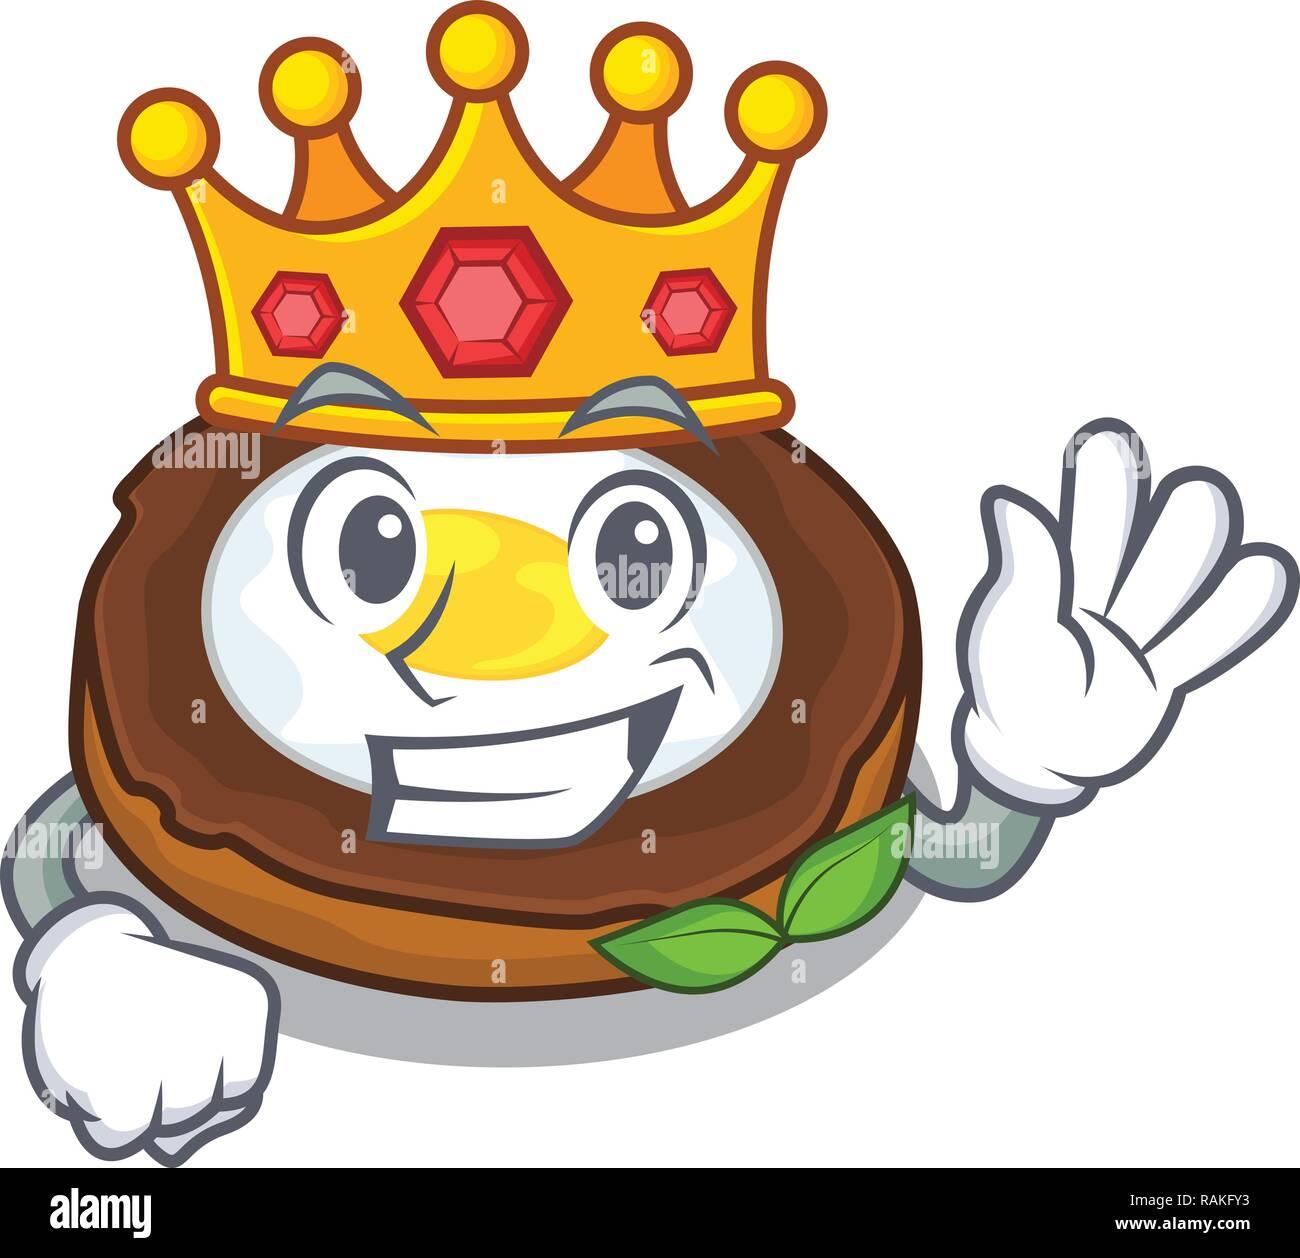 King scotch eggs at the mascot bowl - Stock Vector